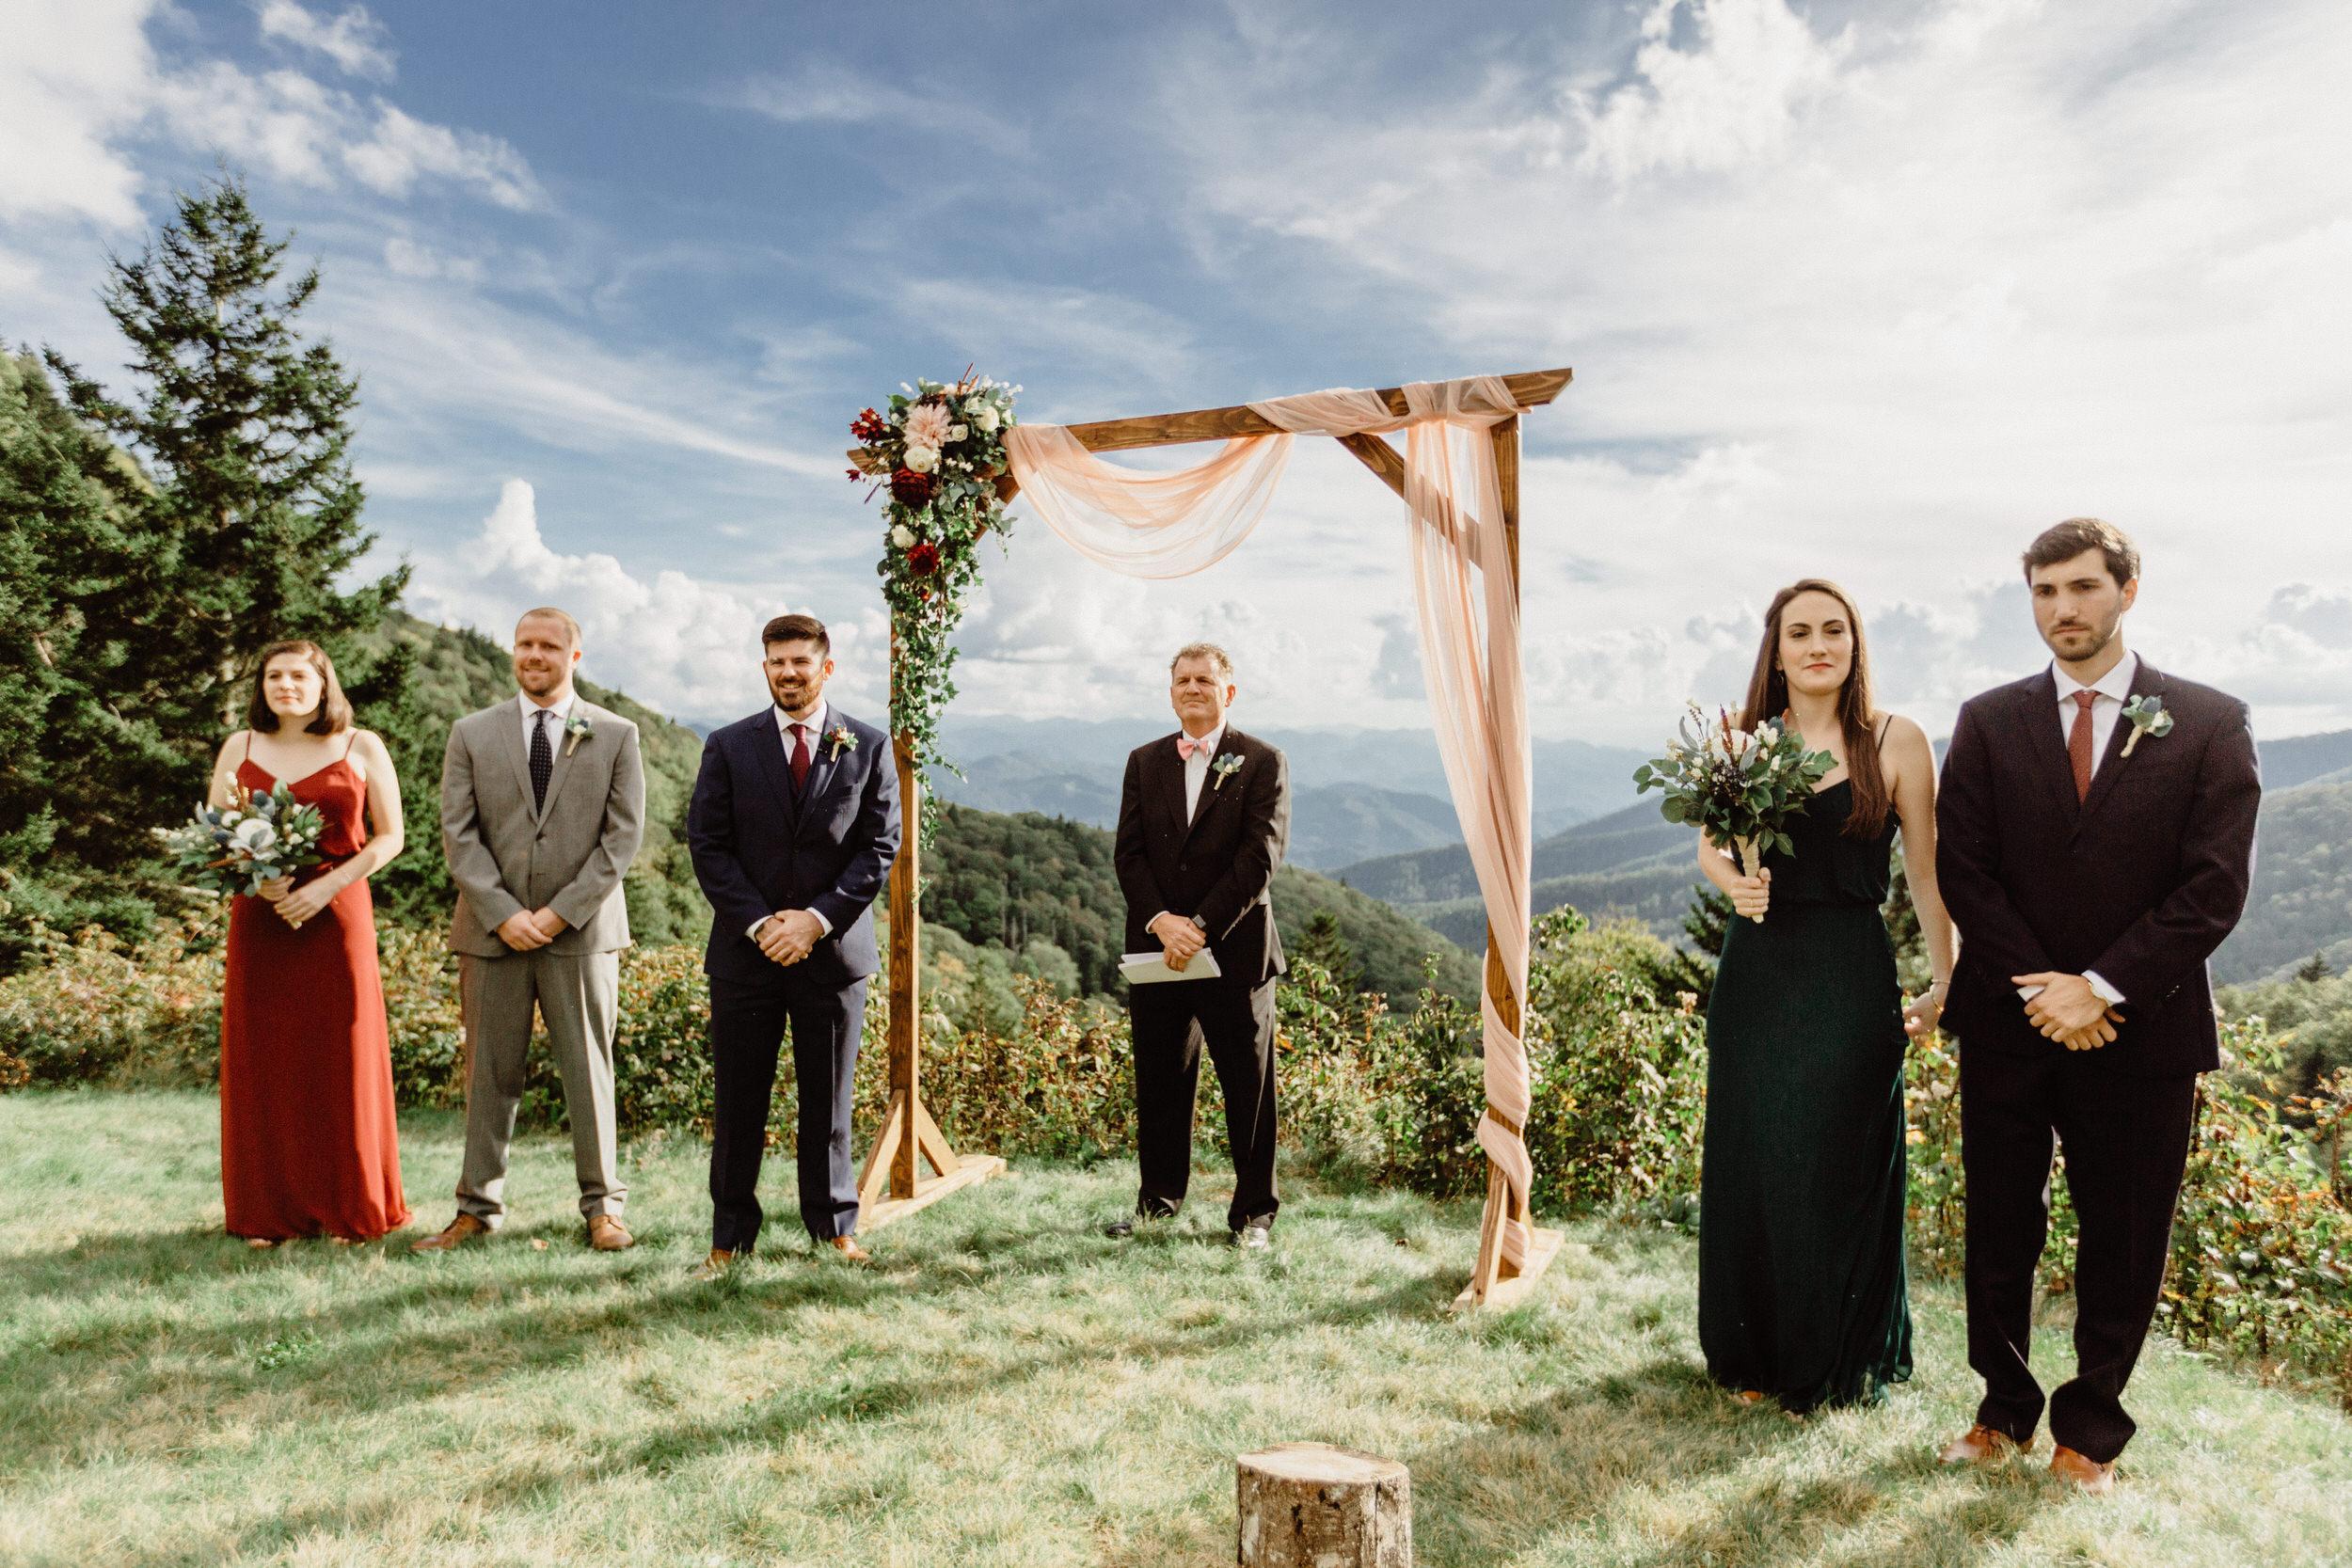 3. Elopement Ceremony- Cole + Rachel's Great Smoky Mountain National Park Elopement-45.jpg